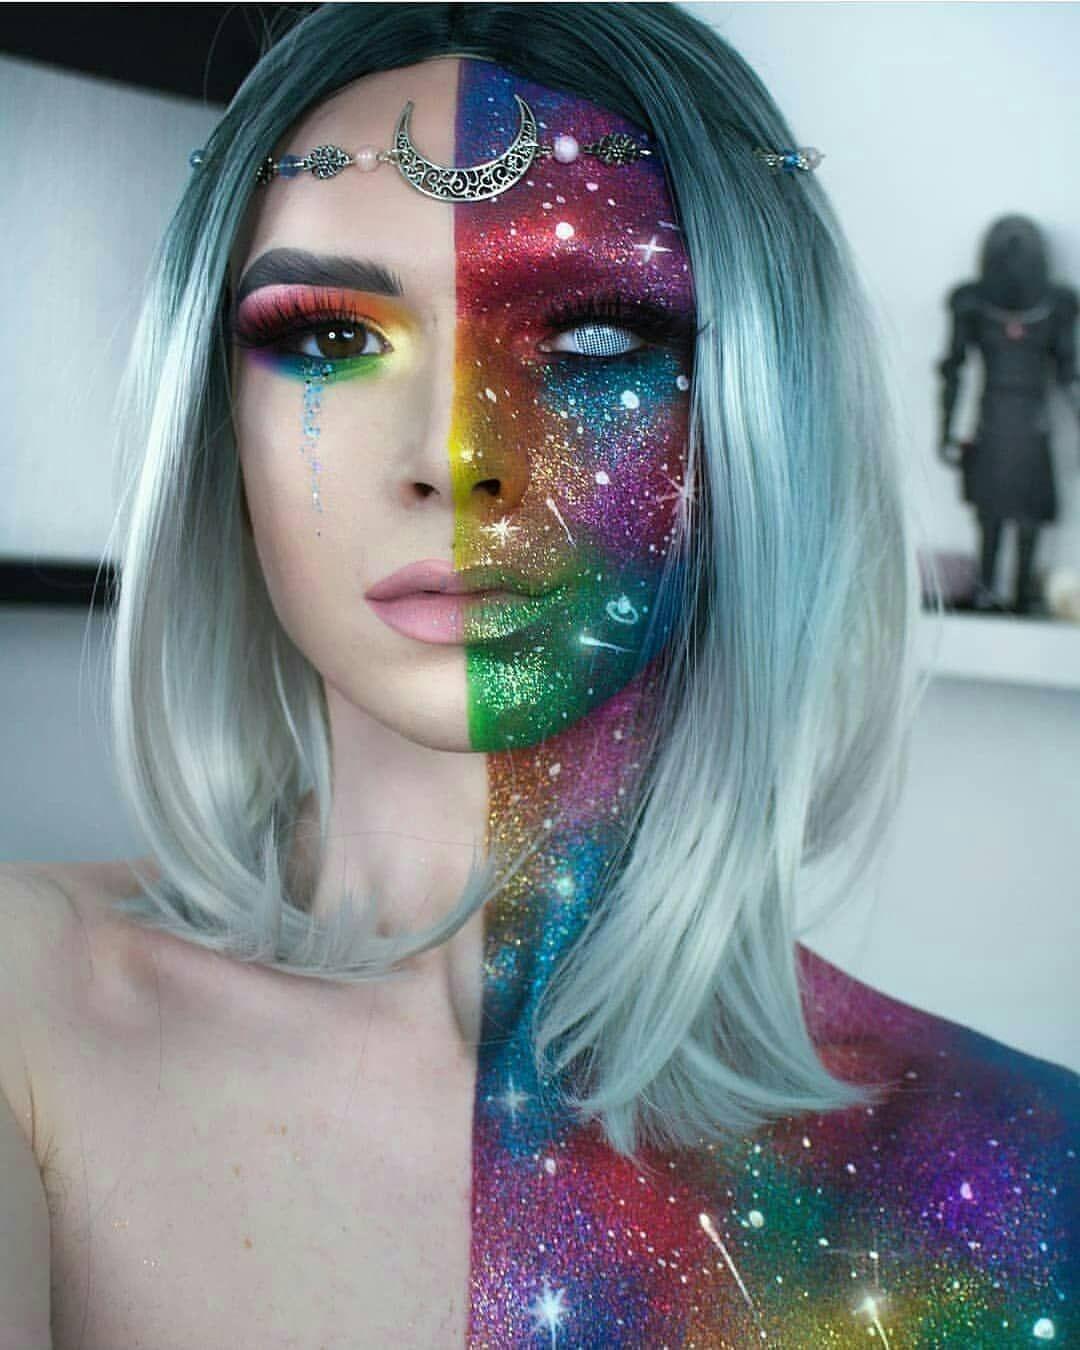 Rainbow Galaxy Space Halloween Costume Party Make Up Creative Makeup Looks Fantasy Makeup Artistry Makeup